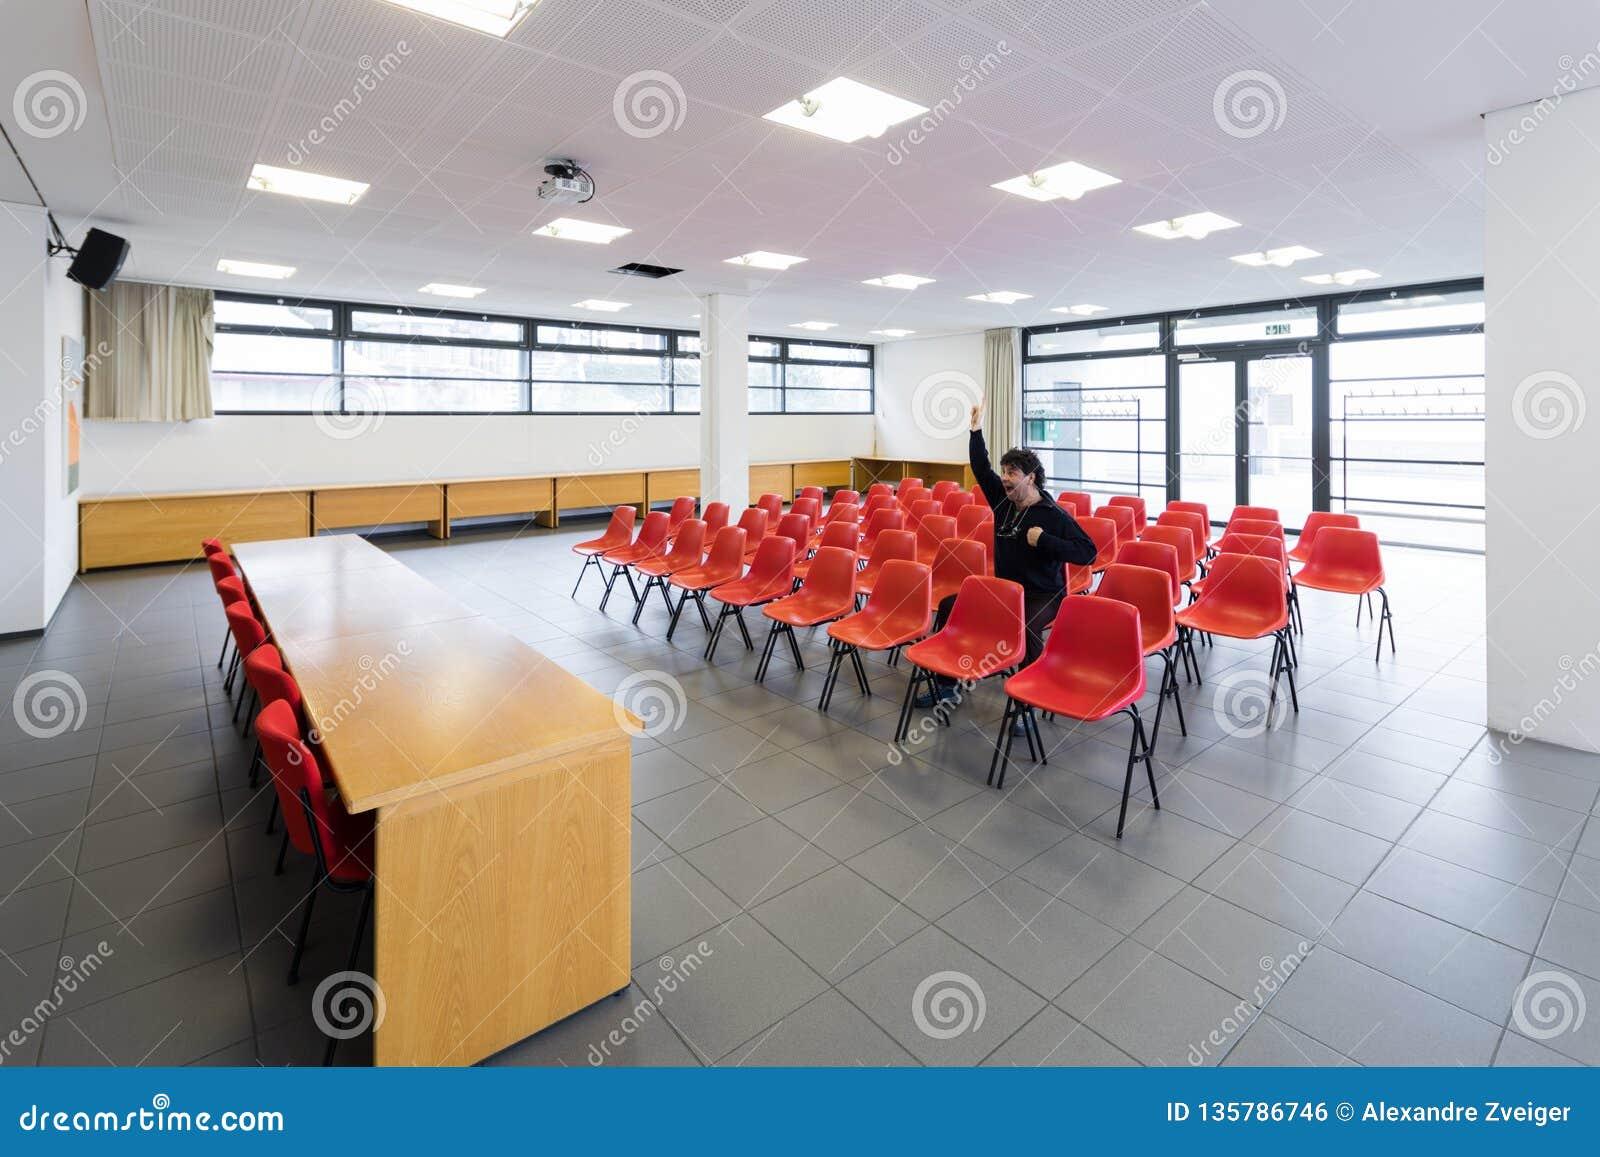 Eenzame mens in lege conferentieruimte, concept